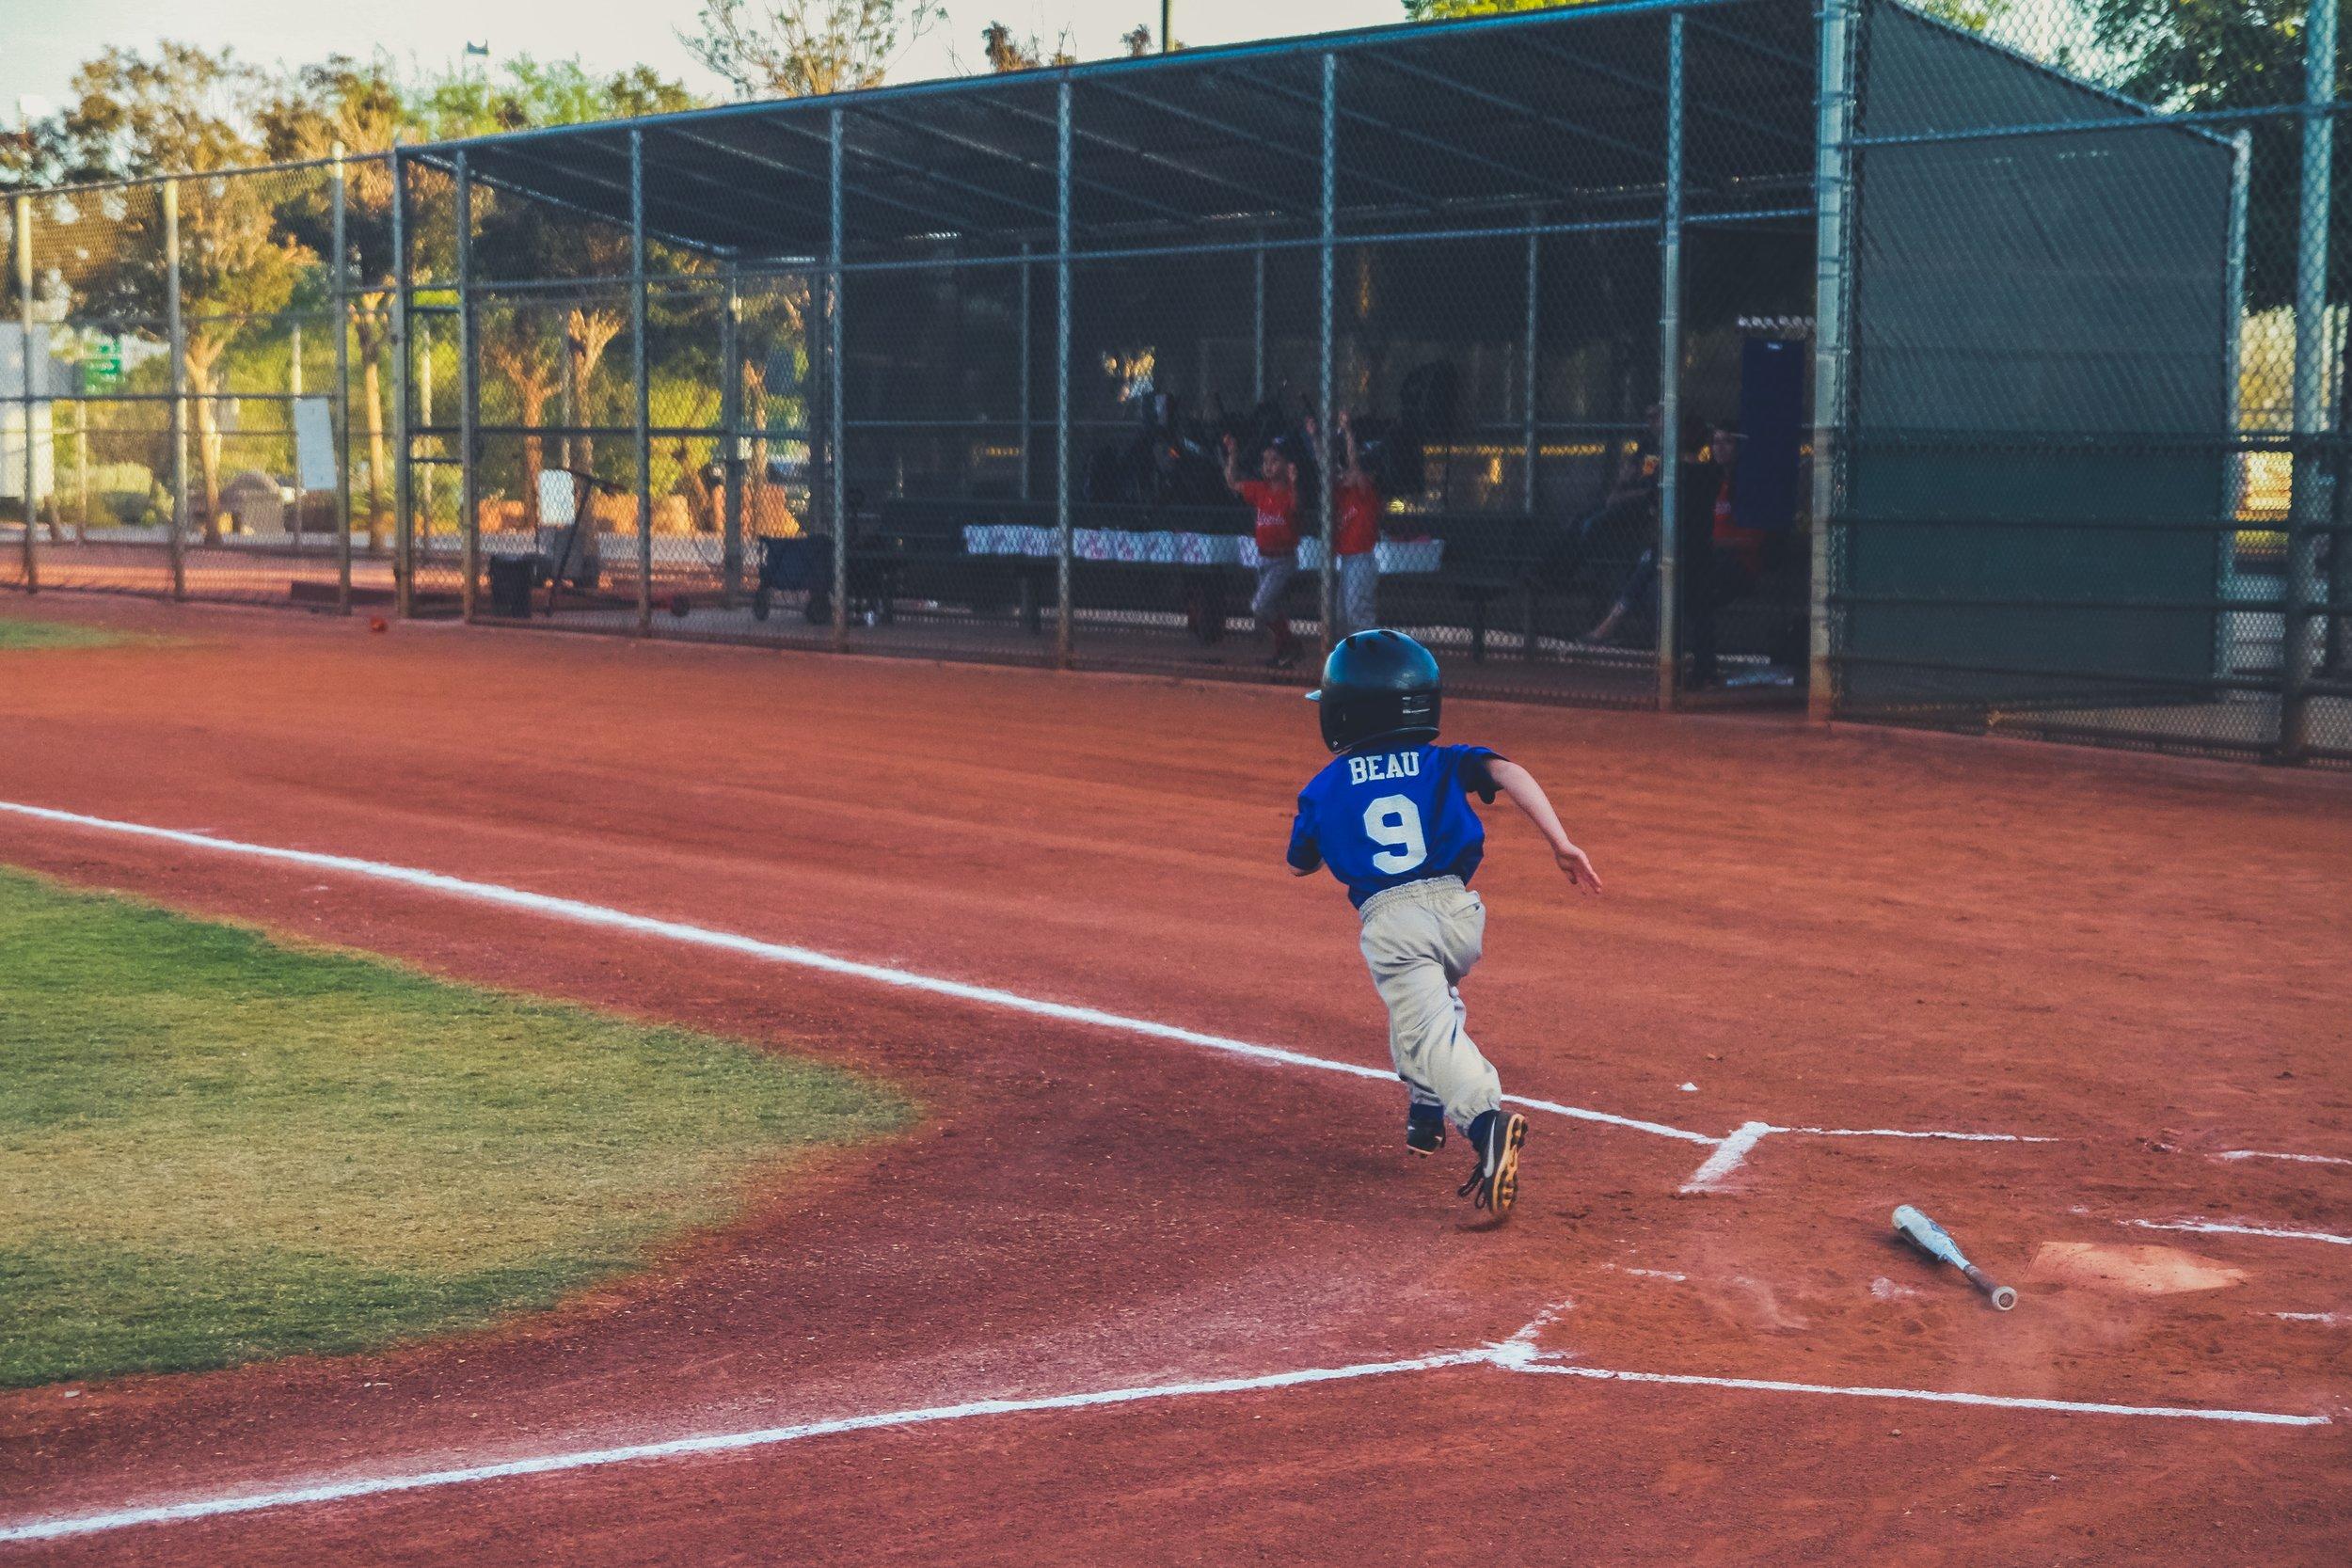 Supporting Baseball Teammate